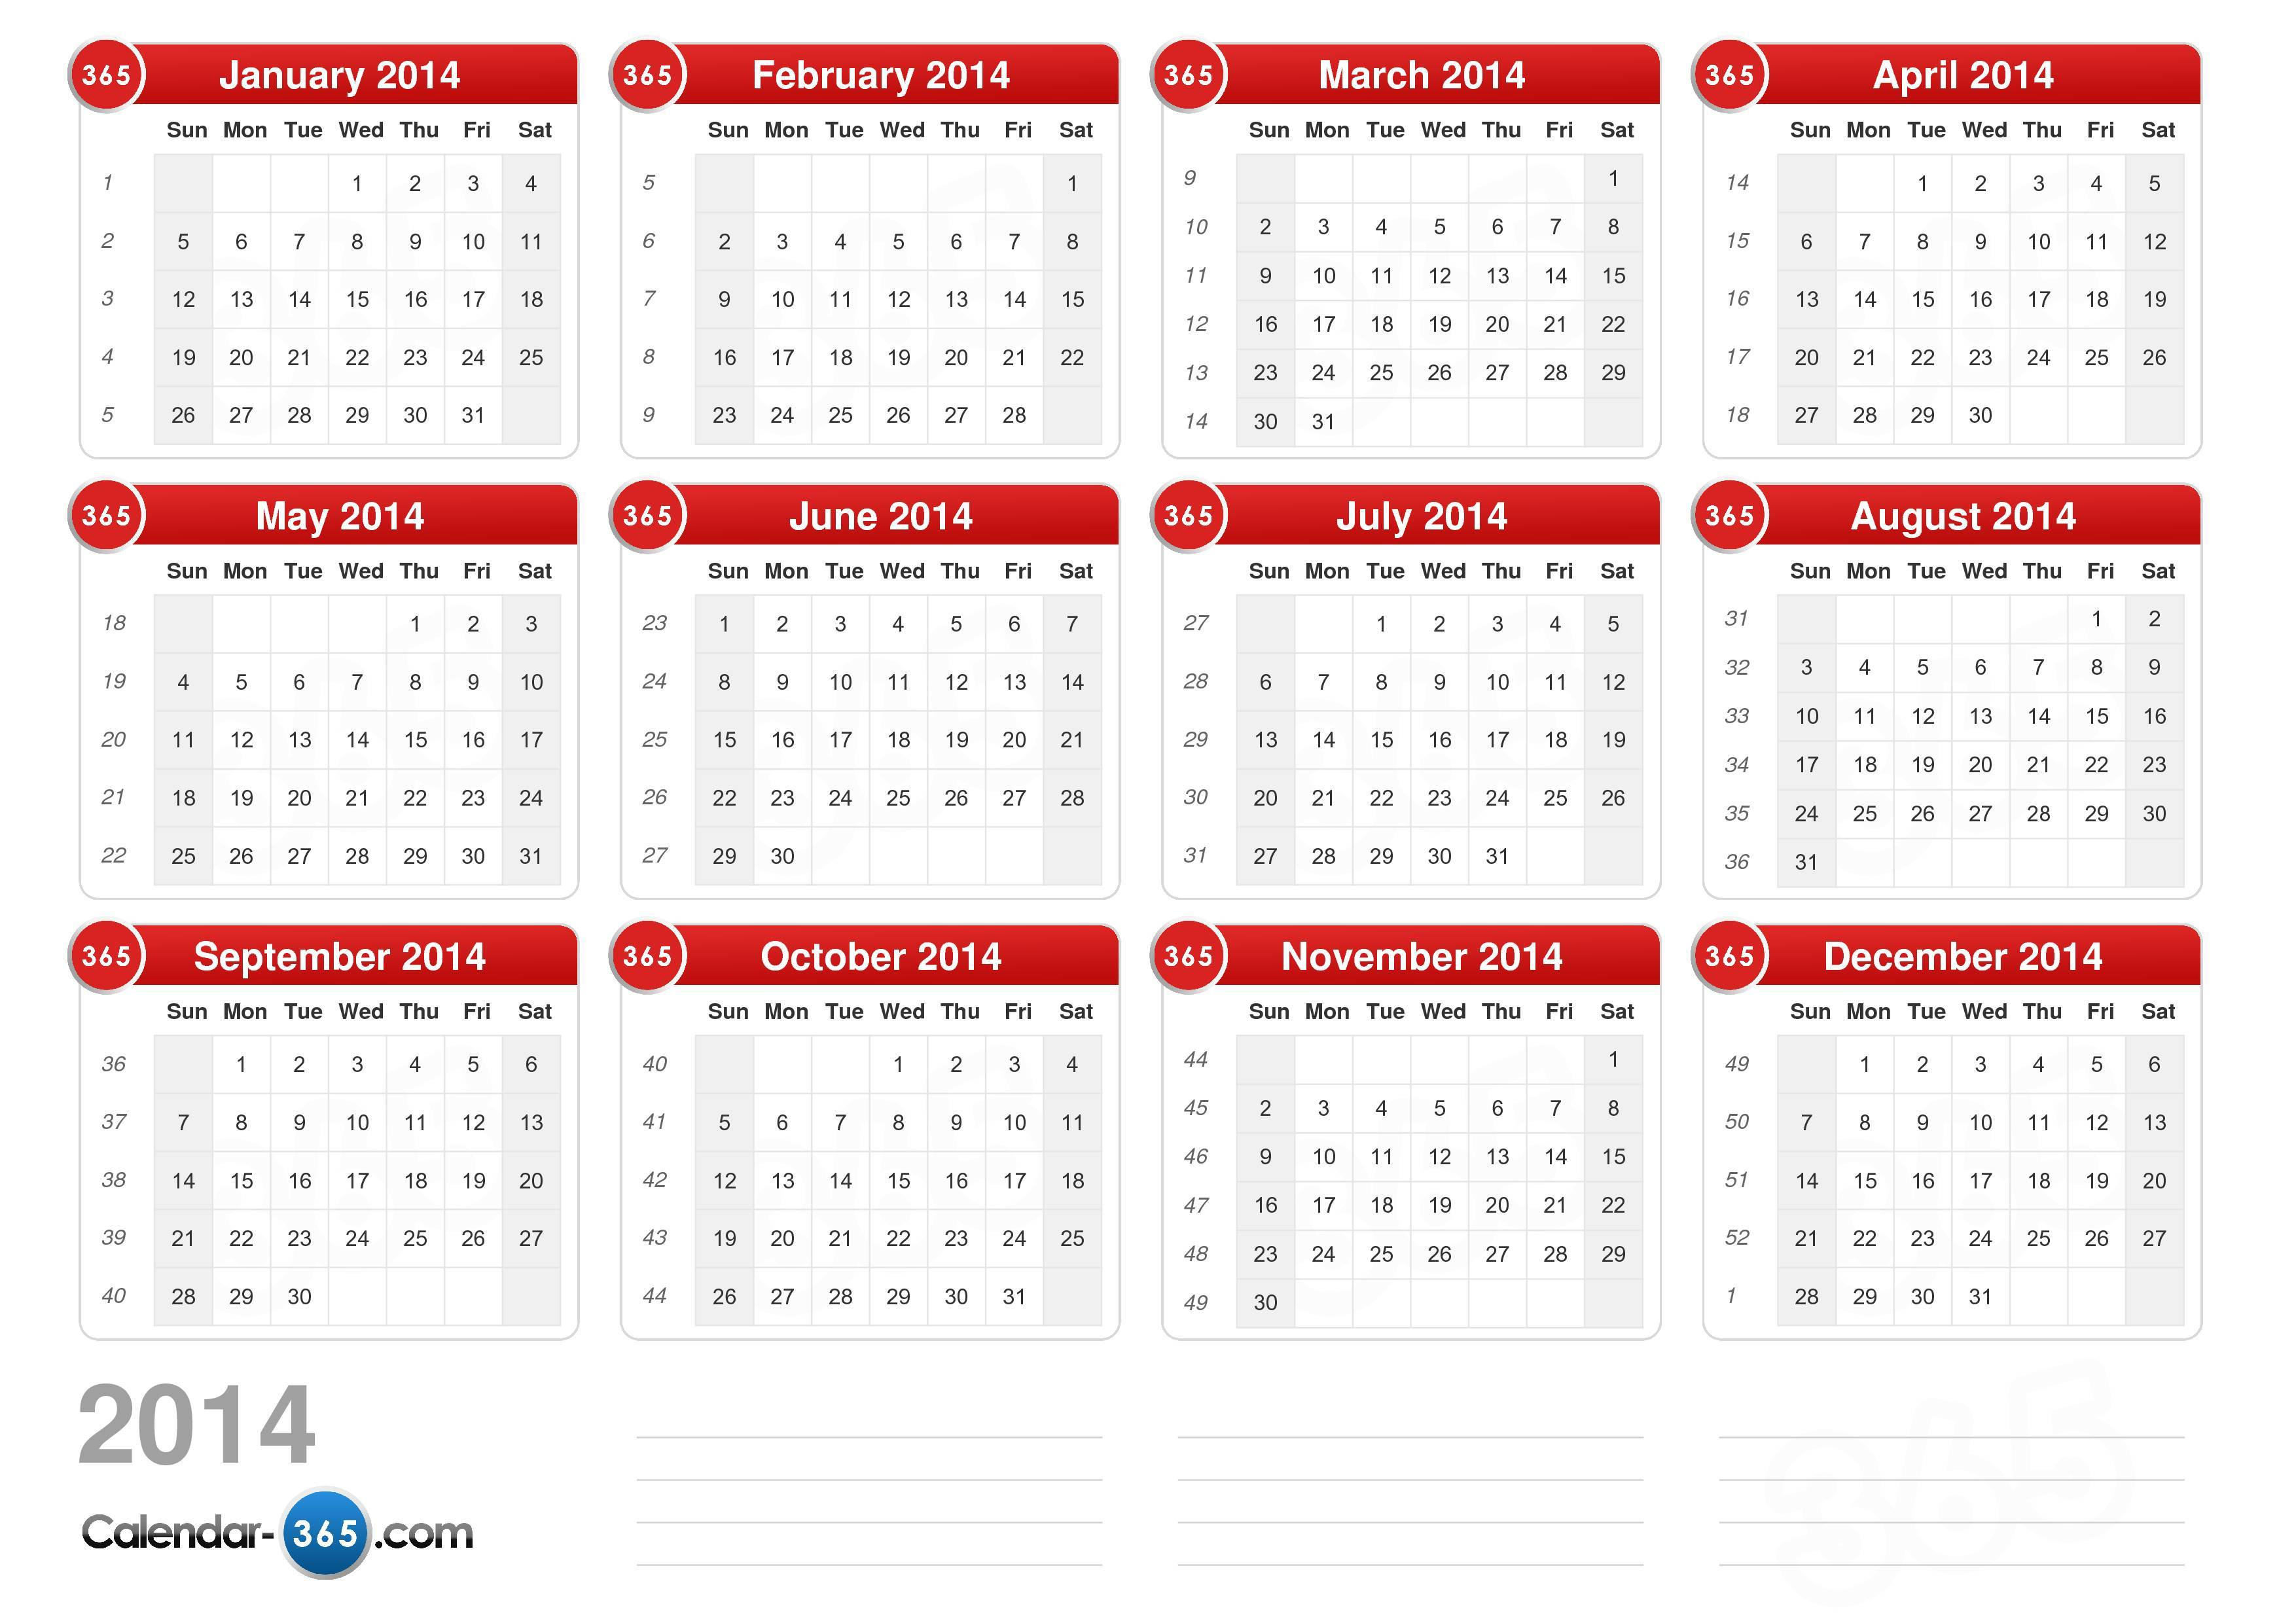 Month Calendar December 2014 Calendar For January 2018 United States Time And Date 2014 Calendar